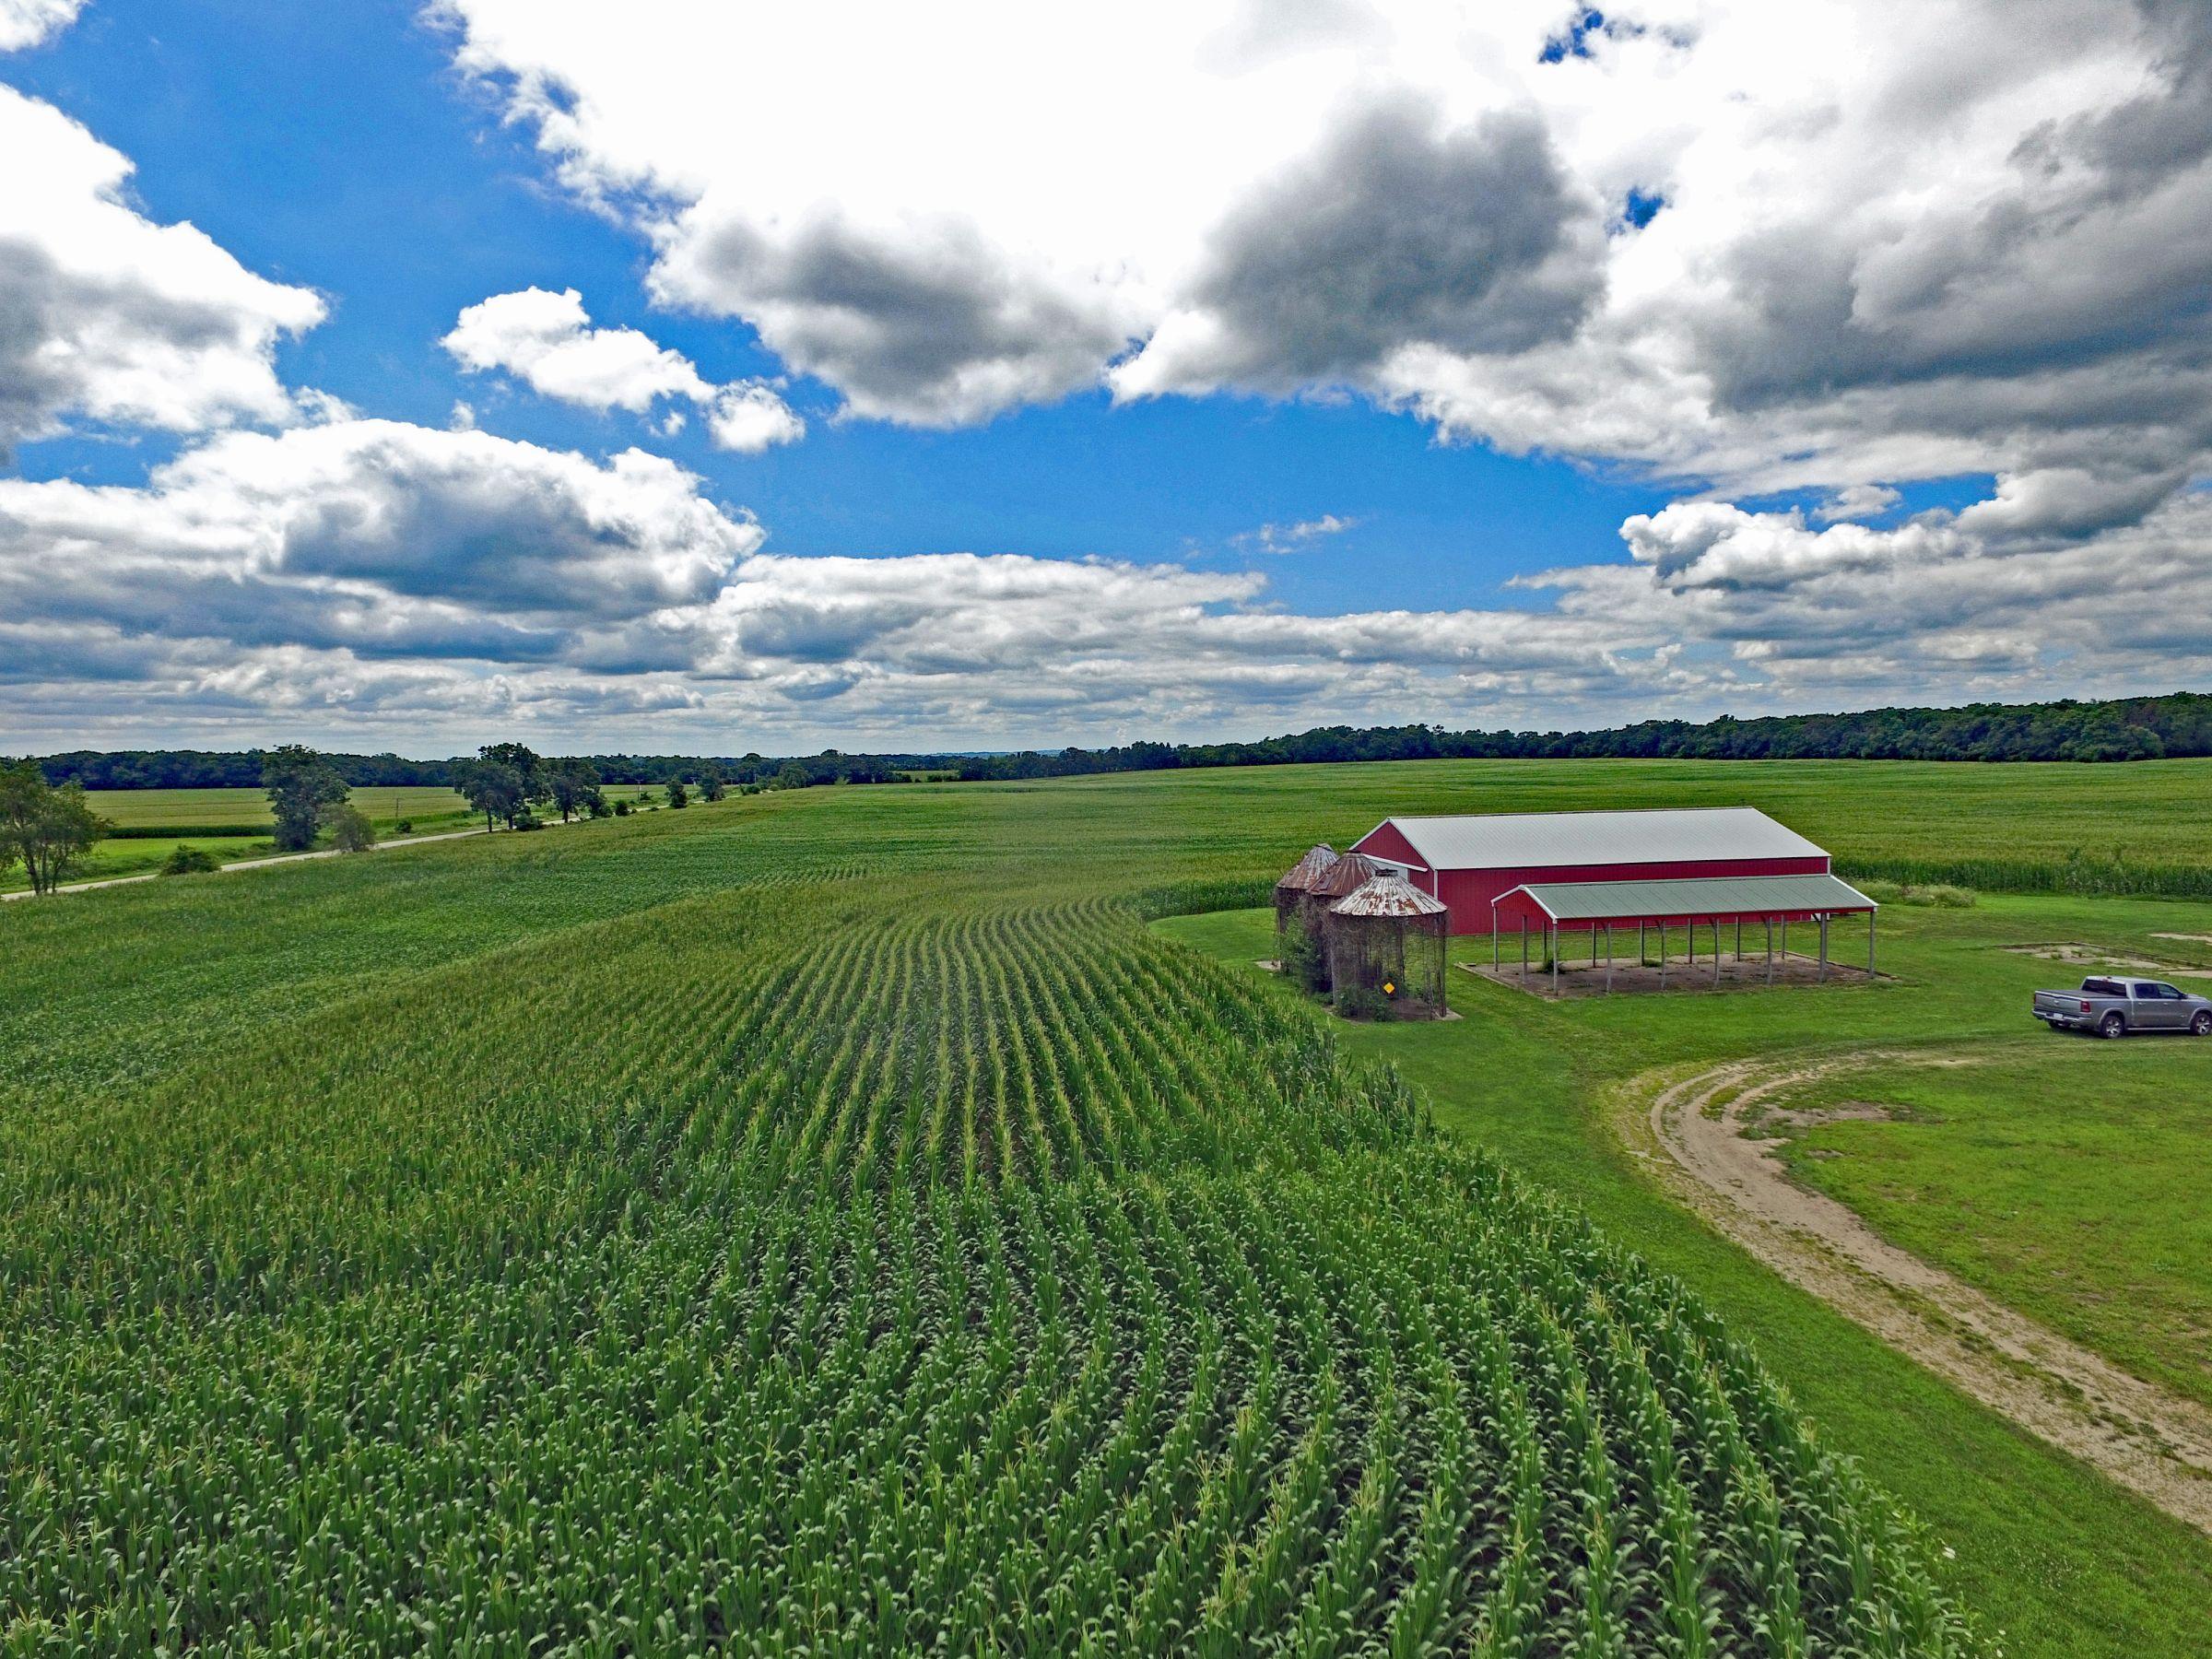 land-winnebago-county-illinois-127-acres-listing-number-15094-0-2020-08-03-160421.jpg